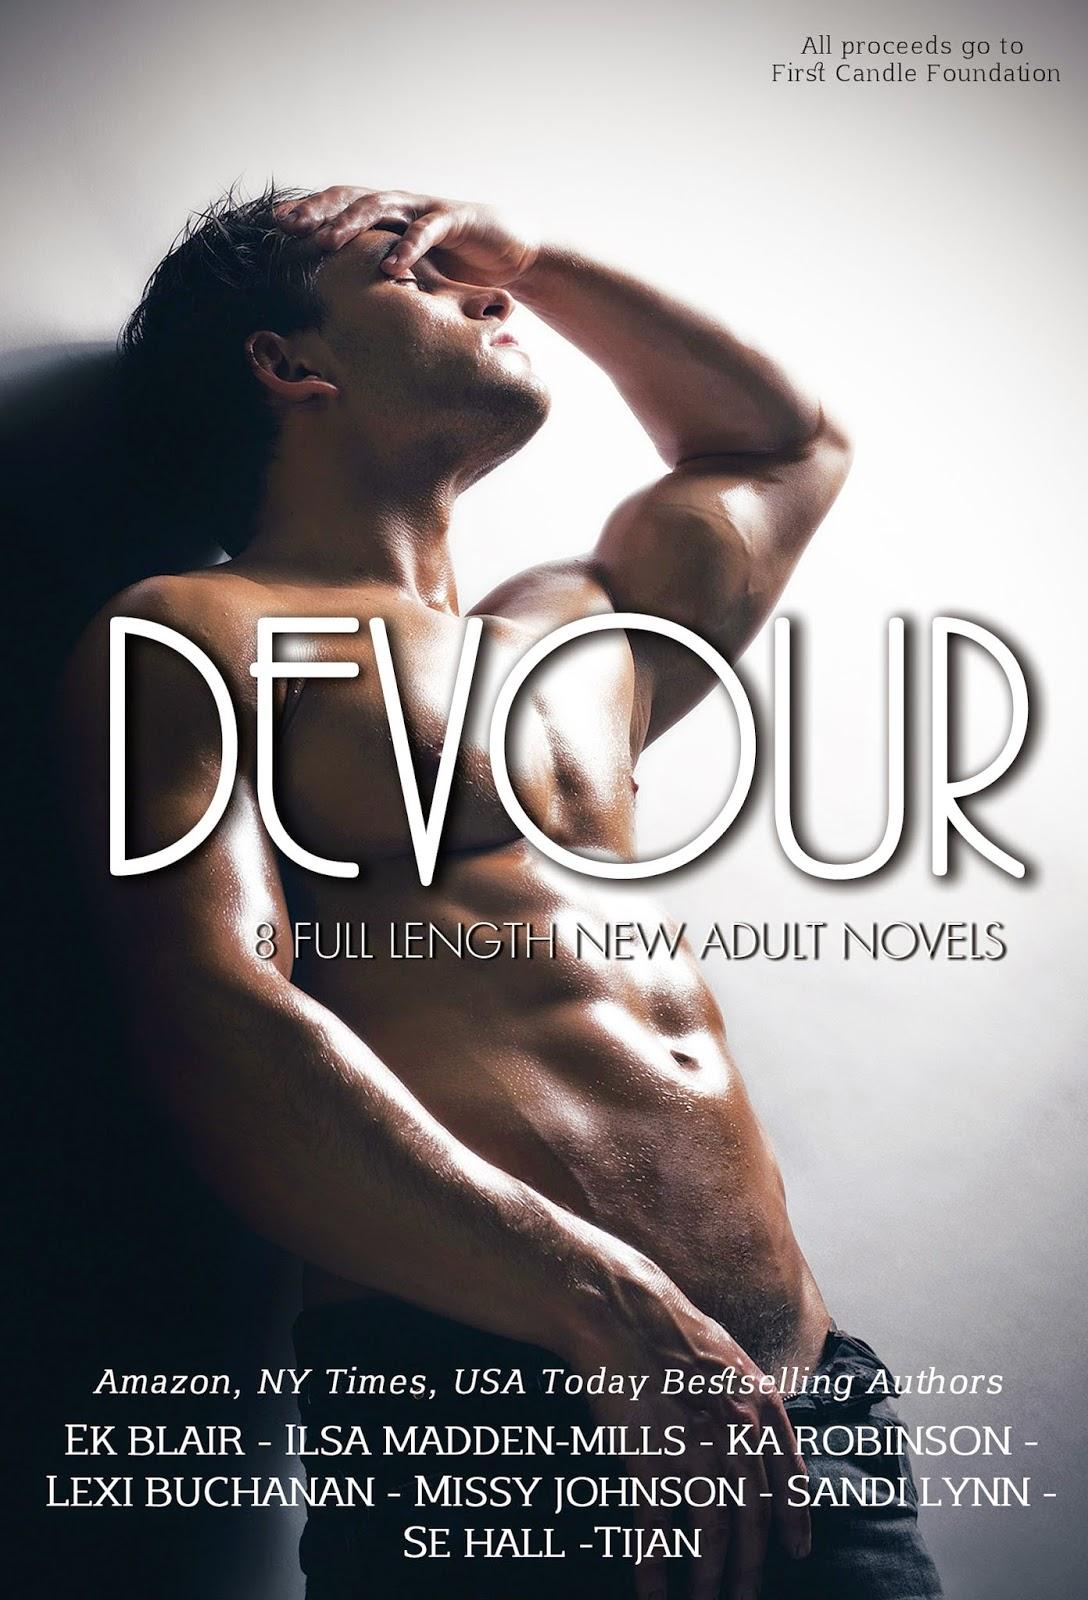 Devour Anthology Promo